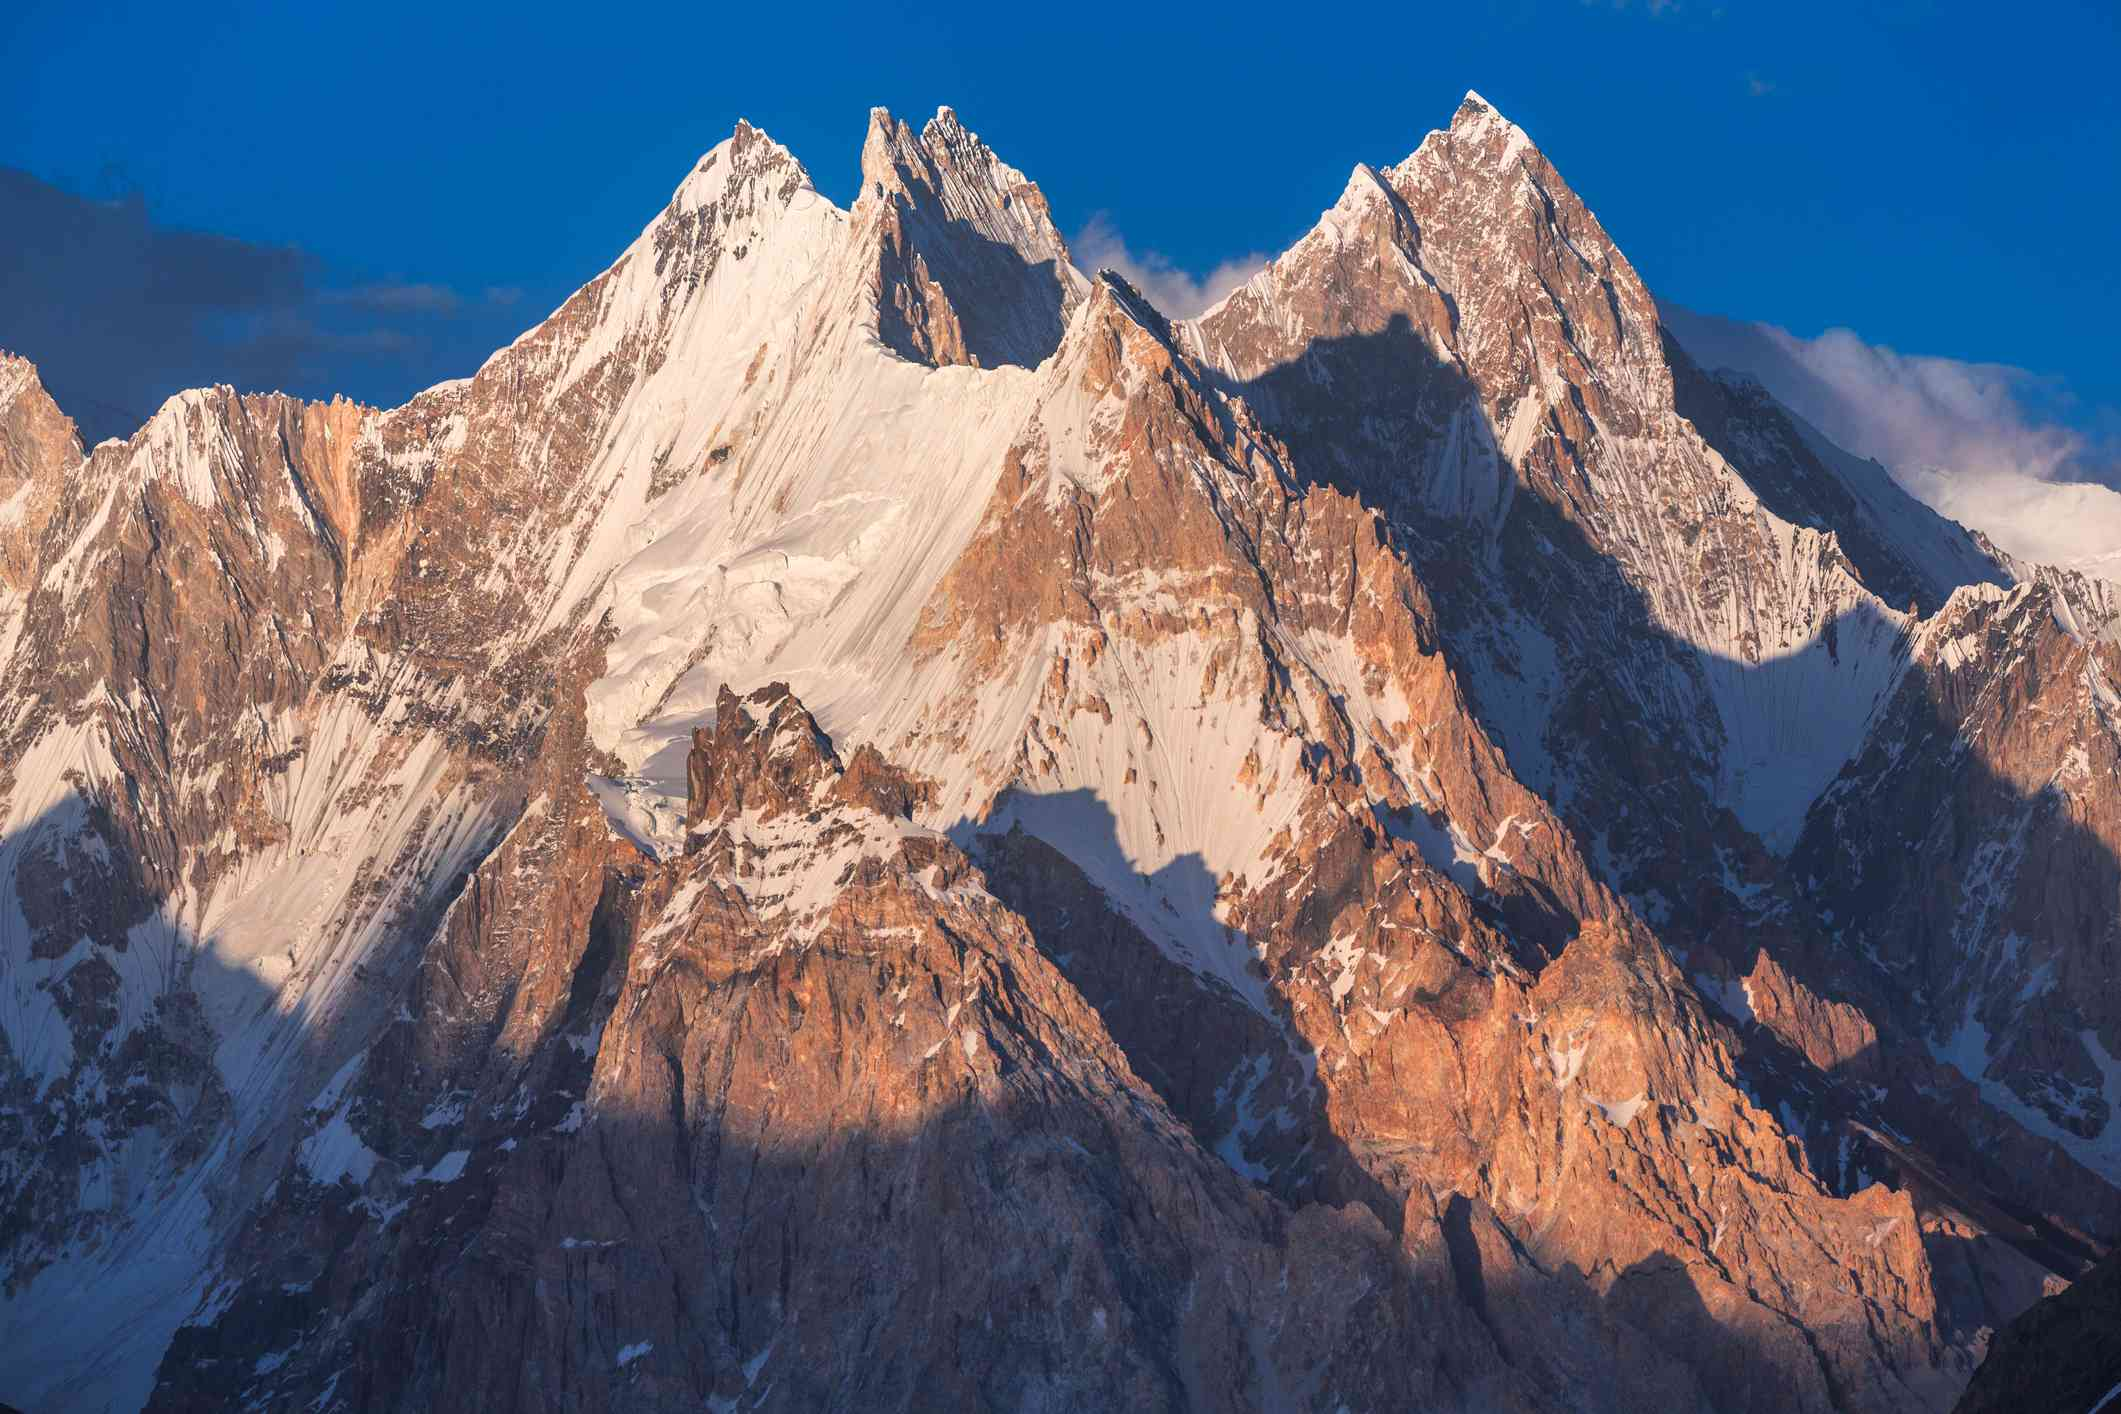 Central Karakoram National Park, Gilgit-Baltistan, Pakistan